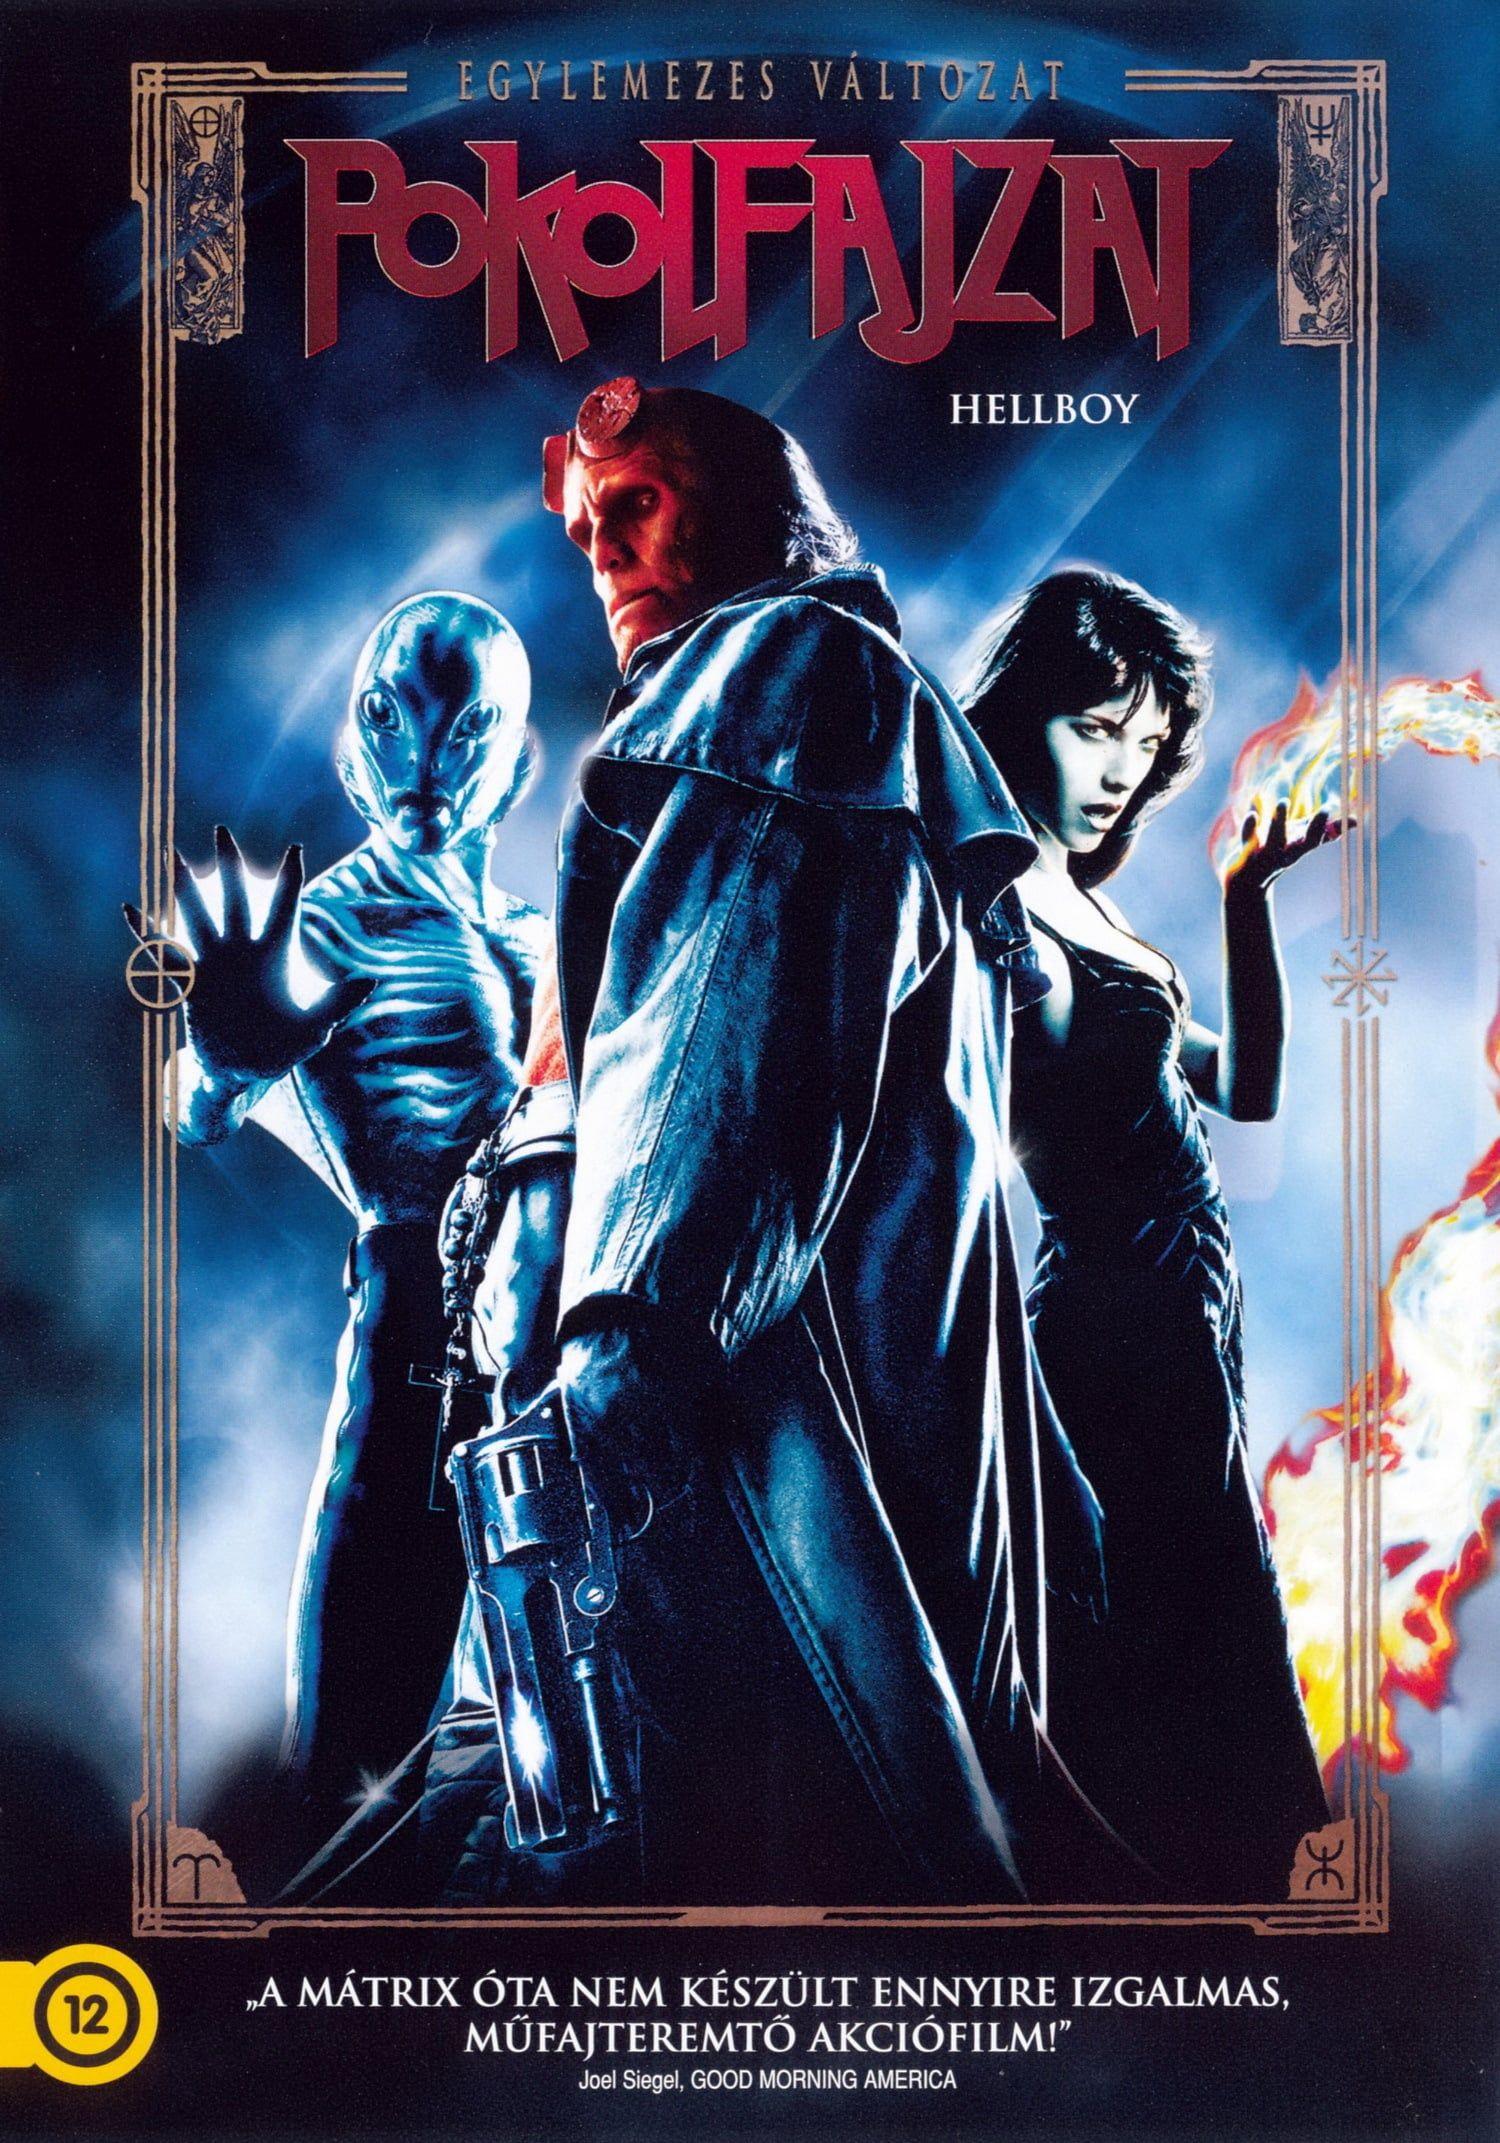 DOWNLOAD Hellboy FULL MOVIE HD1080p Sub English Art